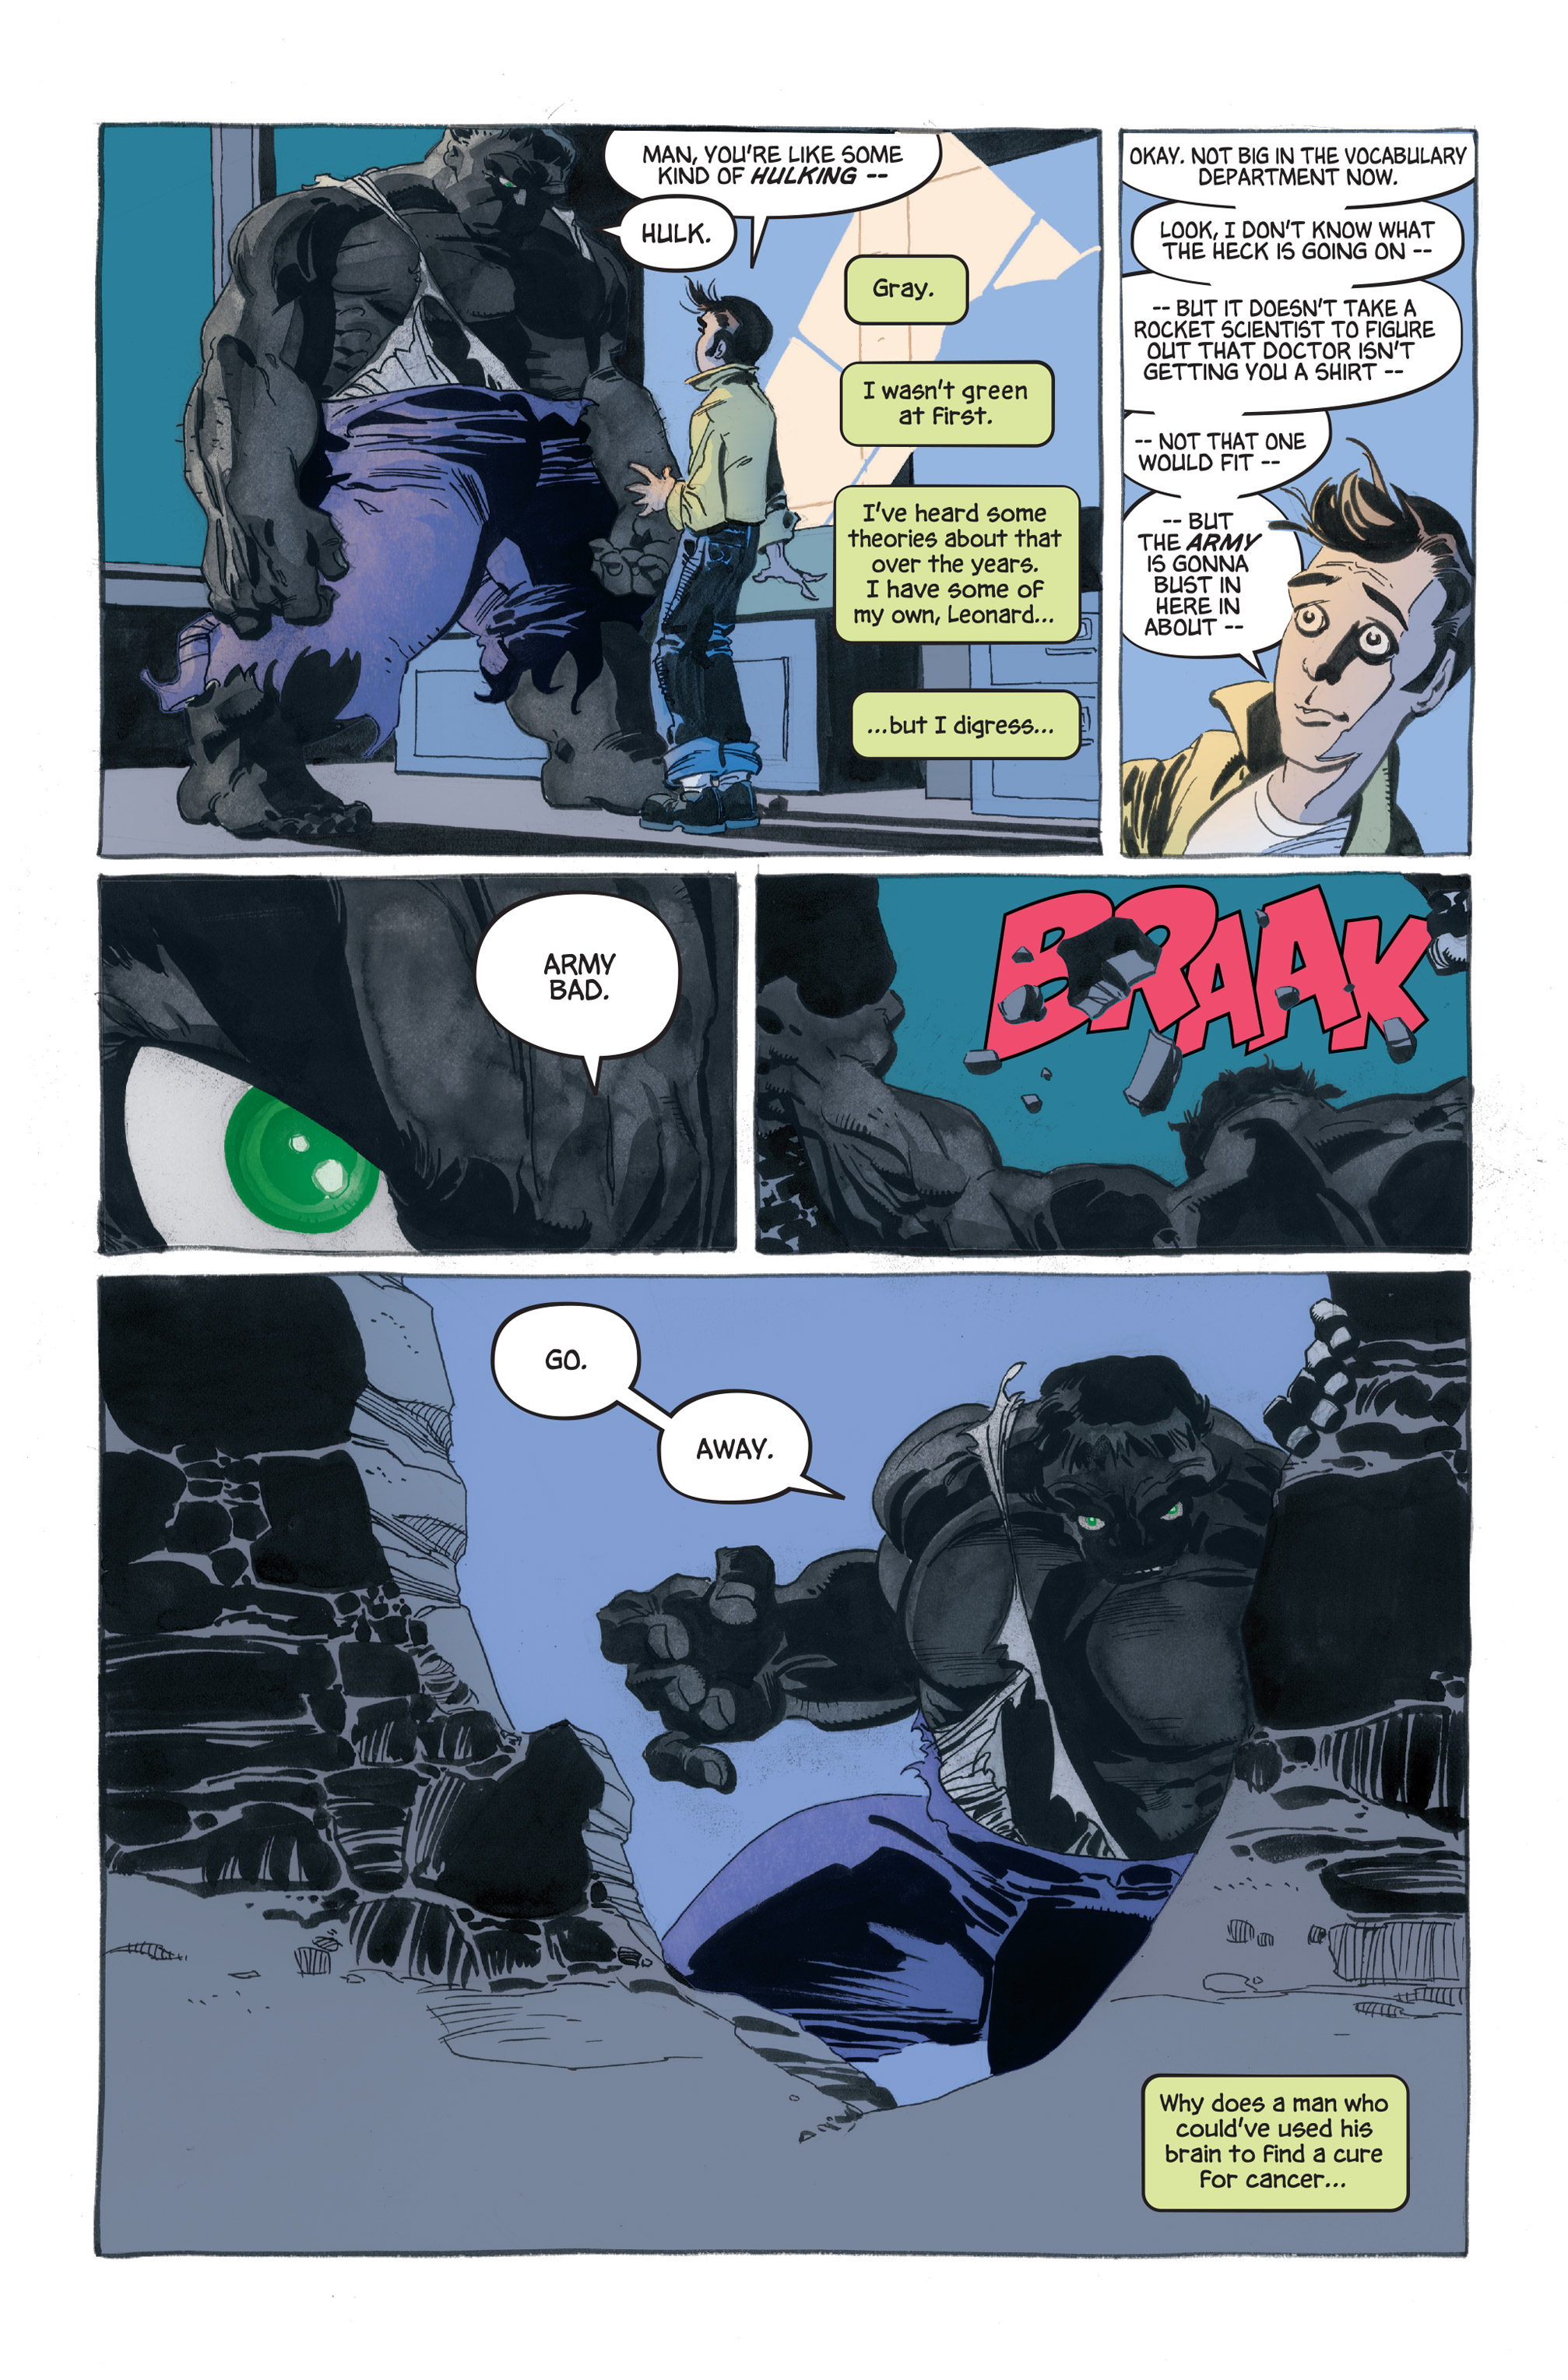 Read online Hulk: Gray comic -  Issue #1 - 15